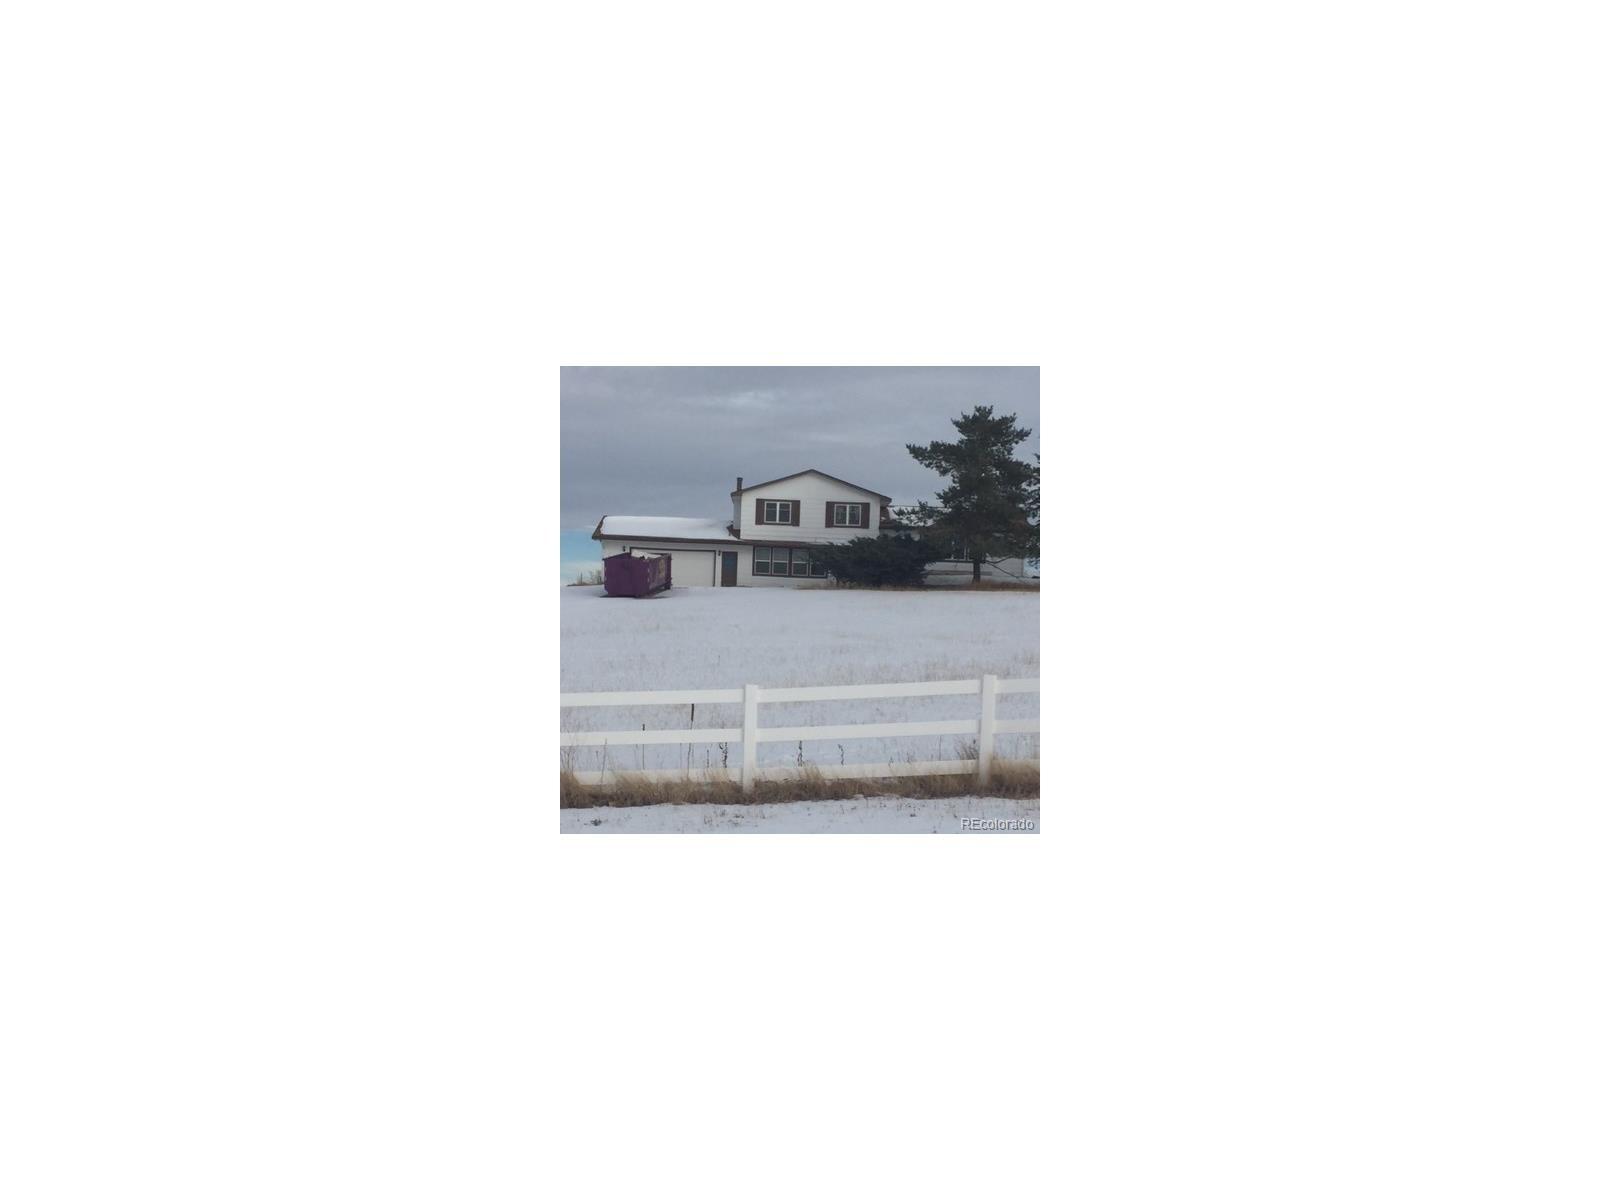 MLS# 8279879 - 3 - 9489 Devils Head Drive, Parker, CO 80138